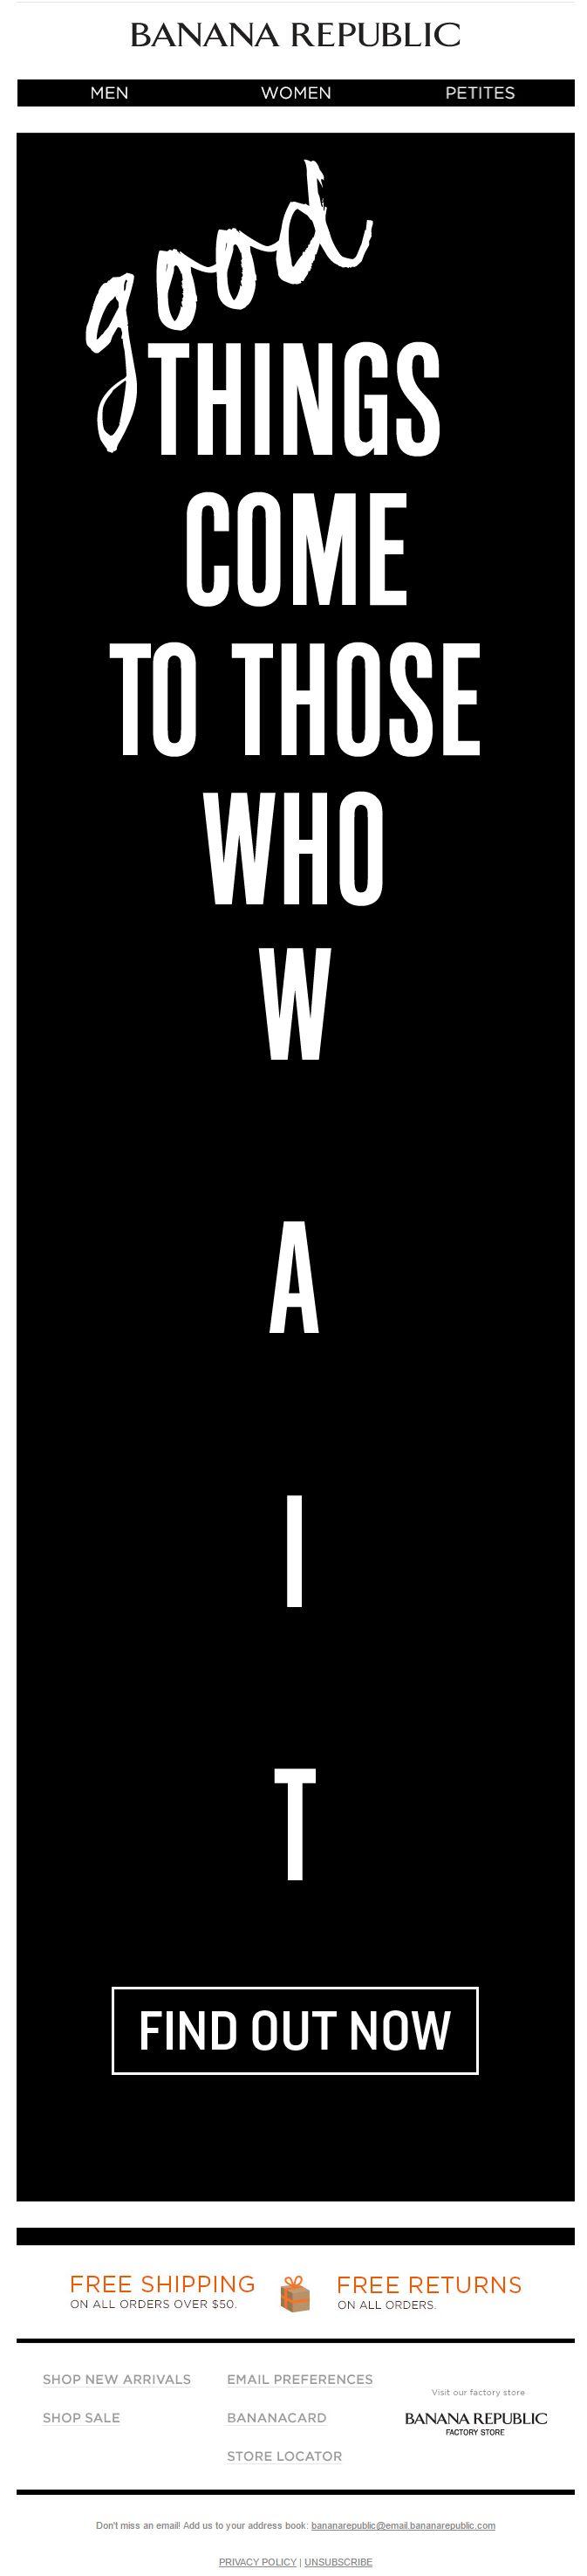 Banana Republic: the main motto is that good things happen when you really await them. But don't fully believe it. This СTA tempts to find out more right now! // Главный креатив кричит о том, что хорошие вещи случаются с теми, кто ждёт. Но не стоит ему верить, CTA внизу письма соблазняет узнать о них прямо сейчас! #emailmatrix #emailmonitoring #design #emailmarketing #email